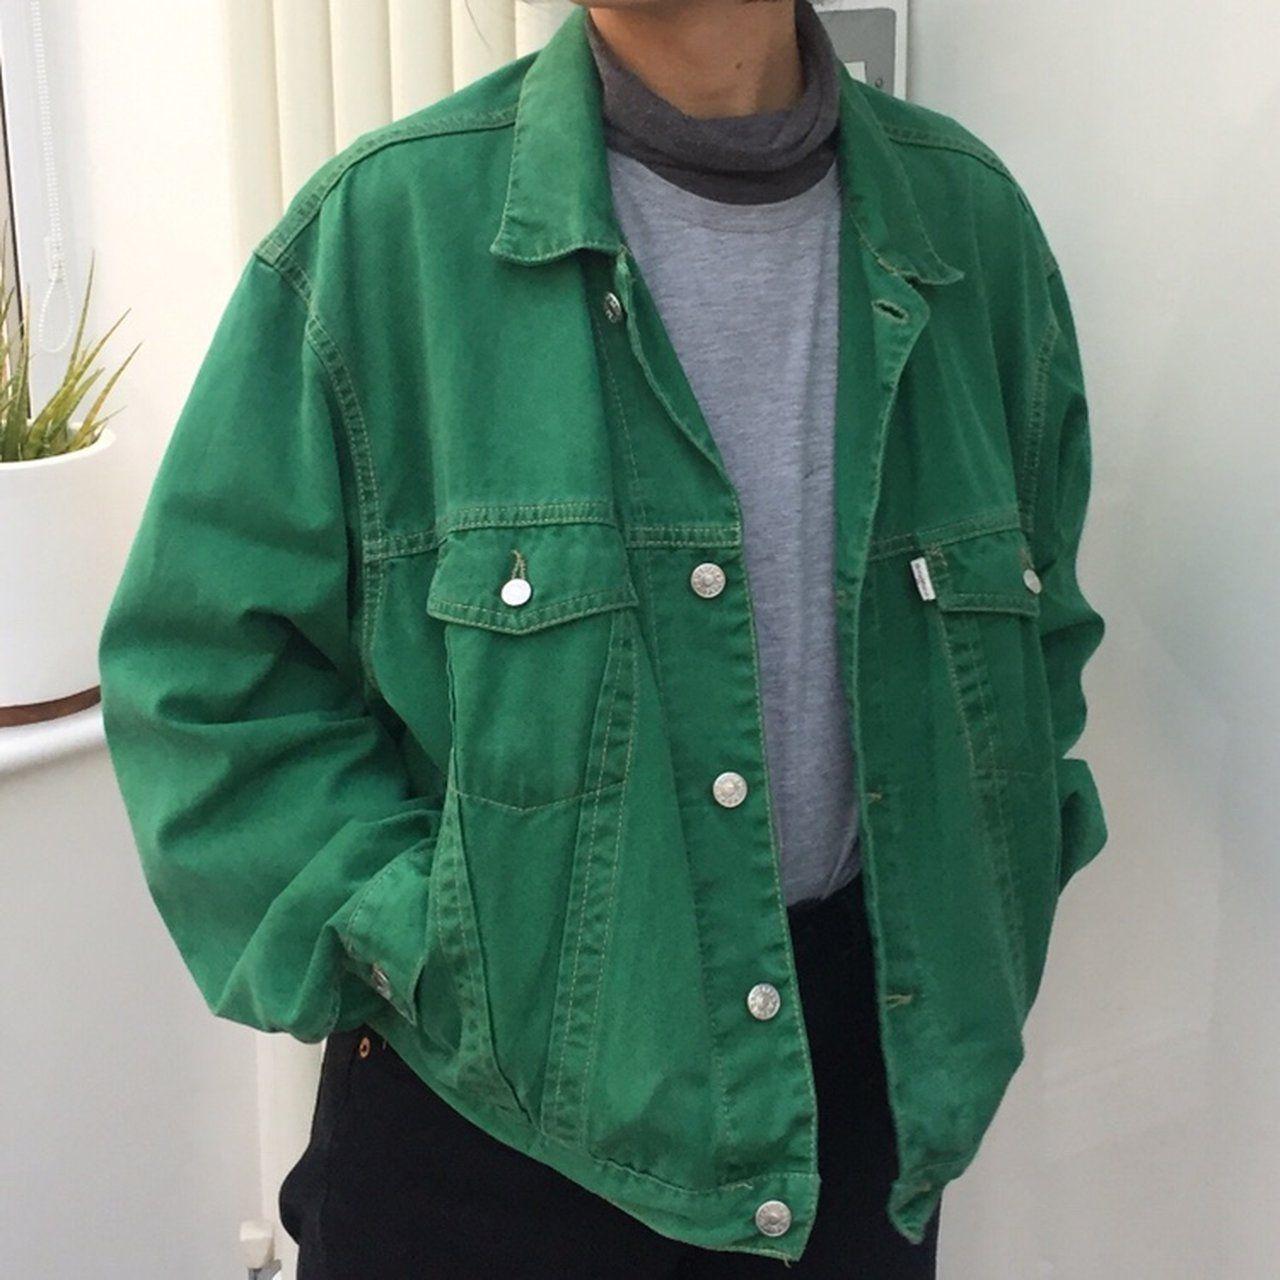 Pin By Robin Chan On Pieces Vintage Denim Jacket Jackets Denim Jacket [ 1280 x 1280 Pixel ]